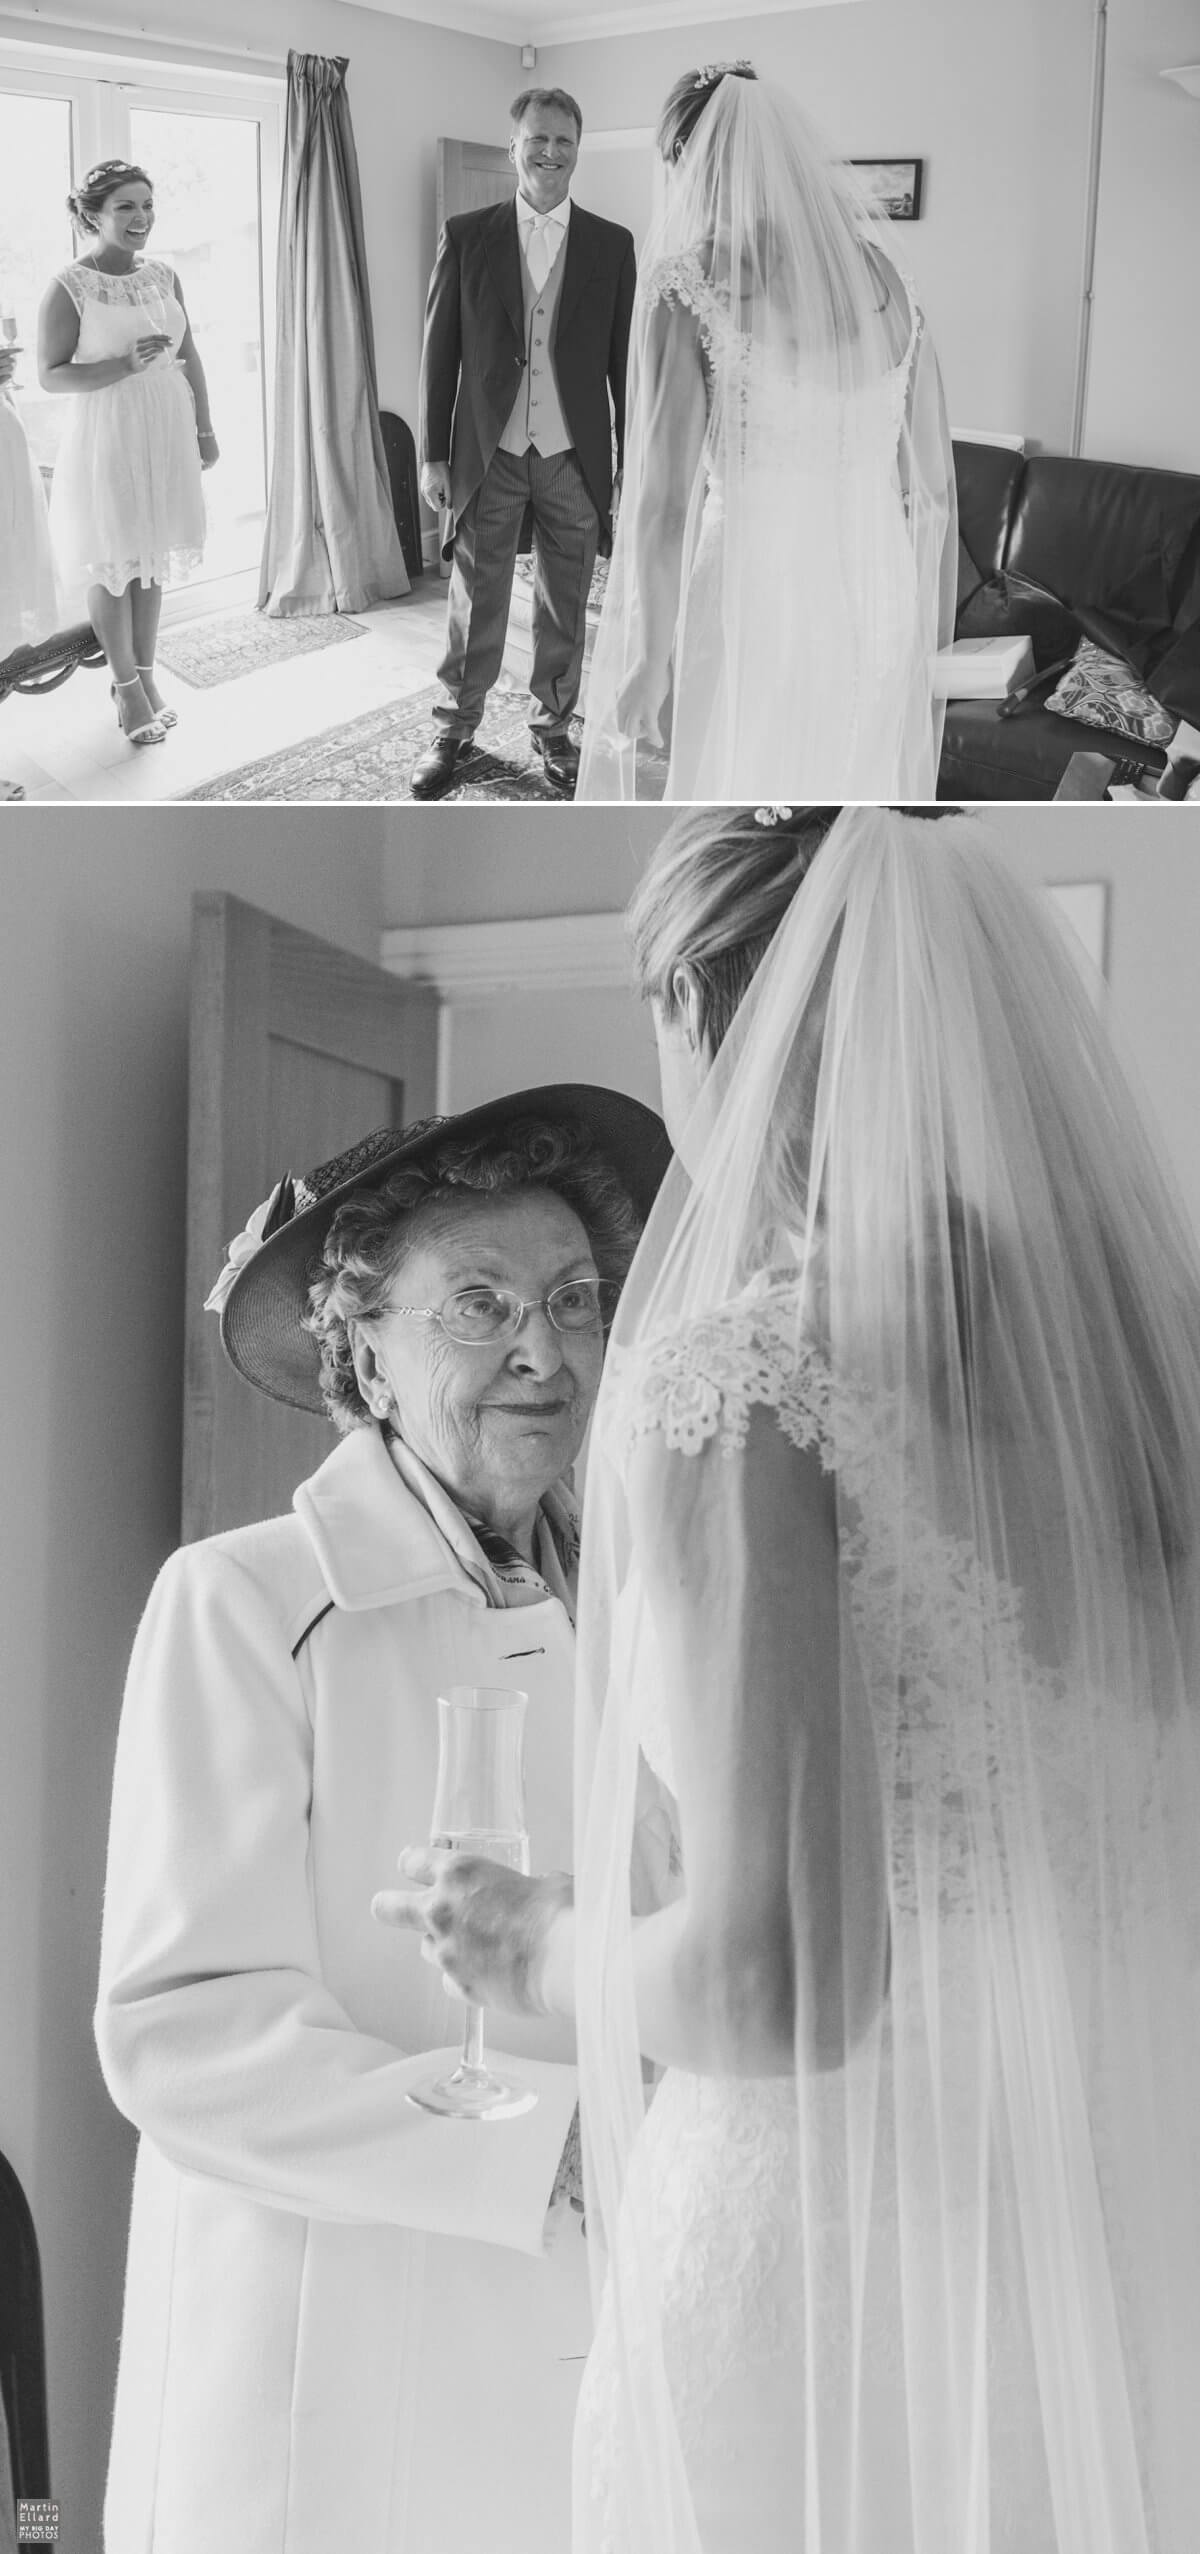 weddings in Swansea